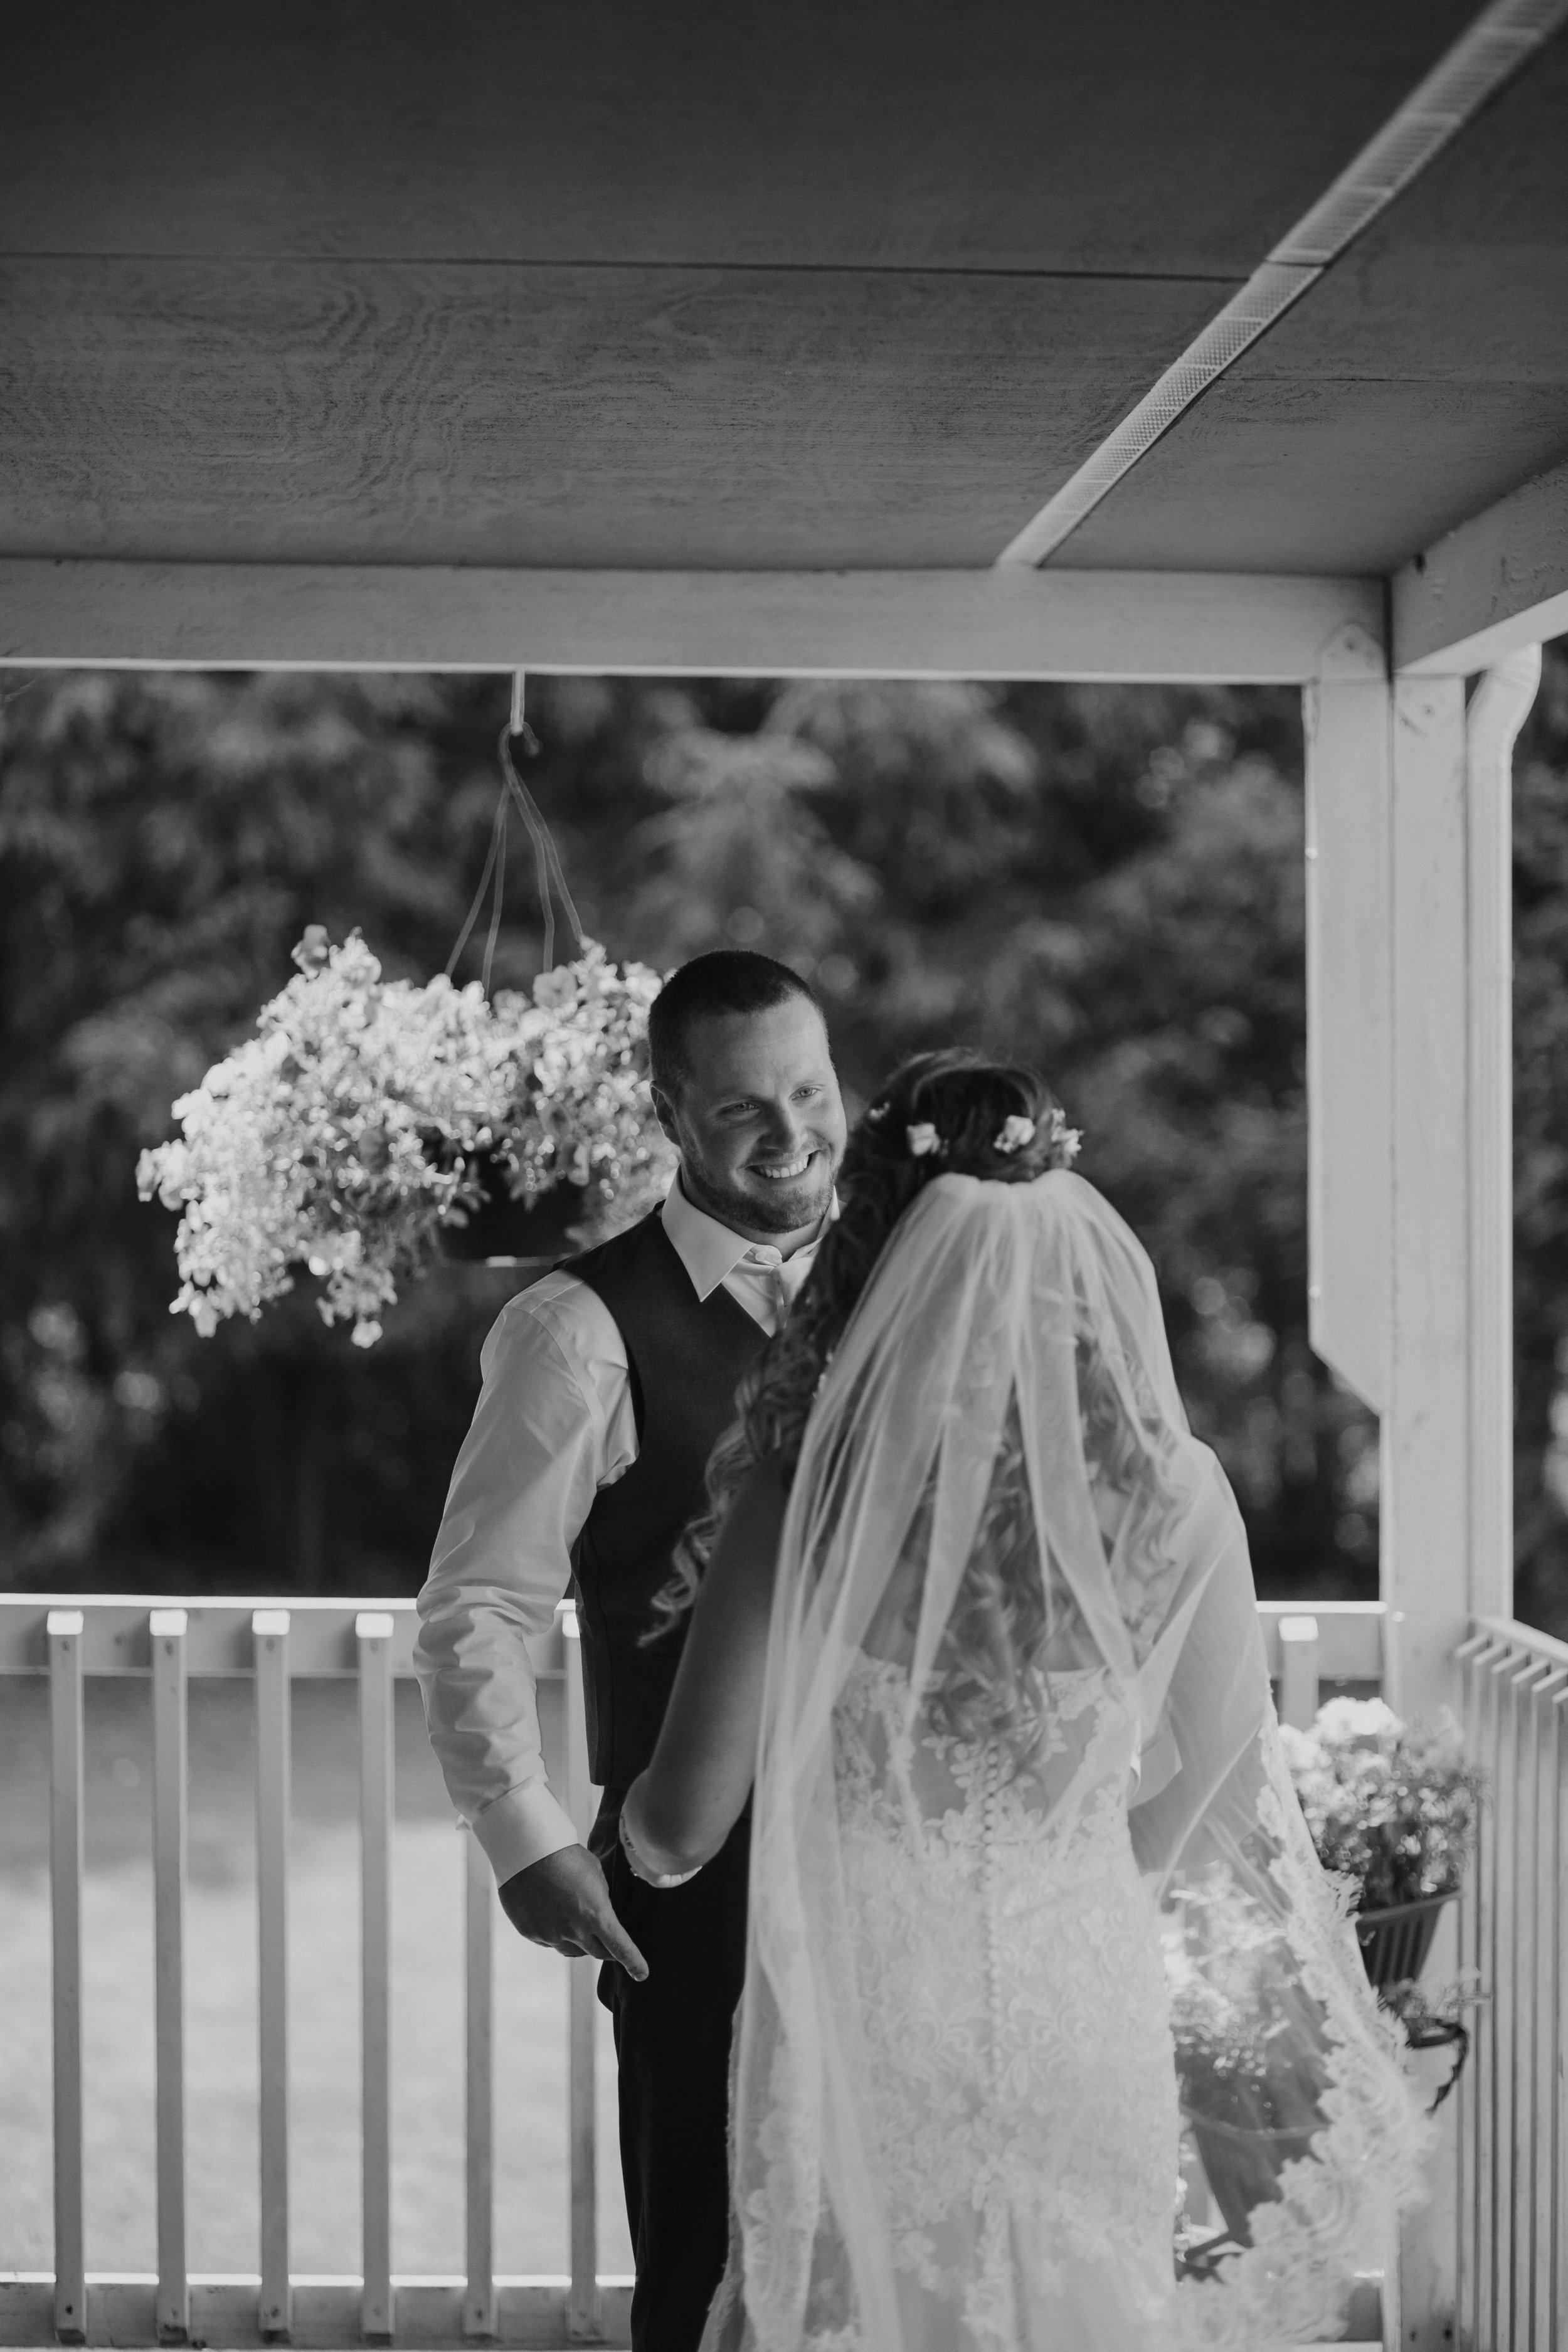 Olympic-Peninsula-Wedding-Photographer-PNW-Forks-Port-Angeles-Kayla-Dawn-Photography-engagement-Olympic-National-Park-154.jpg